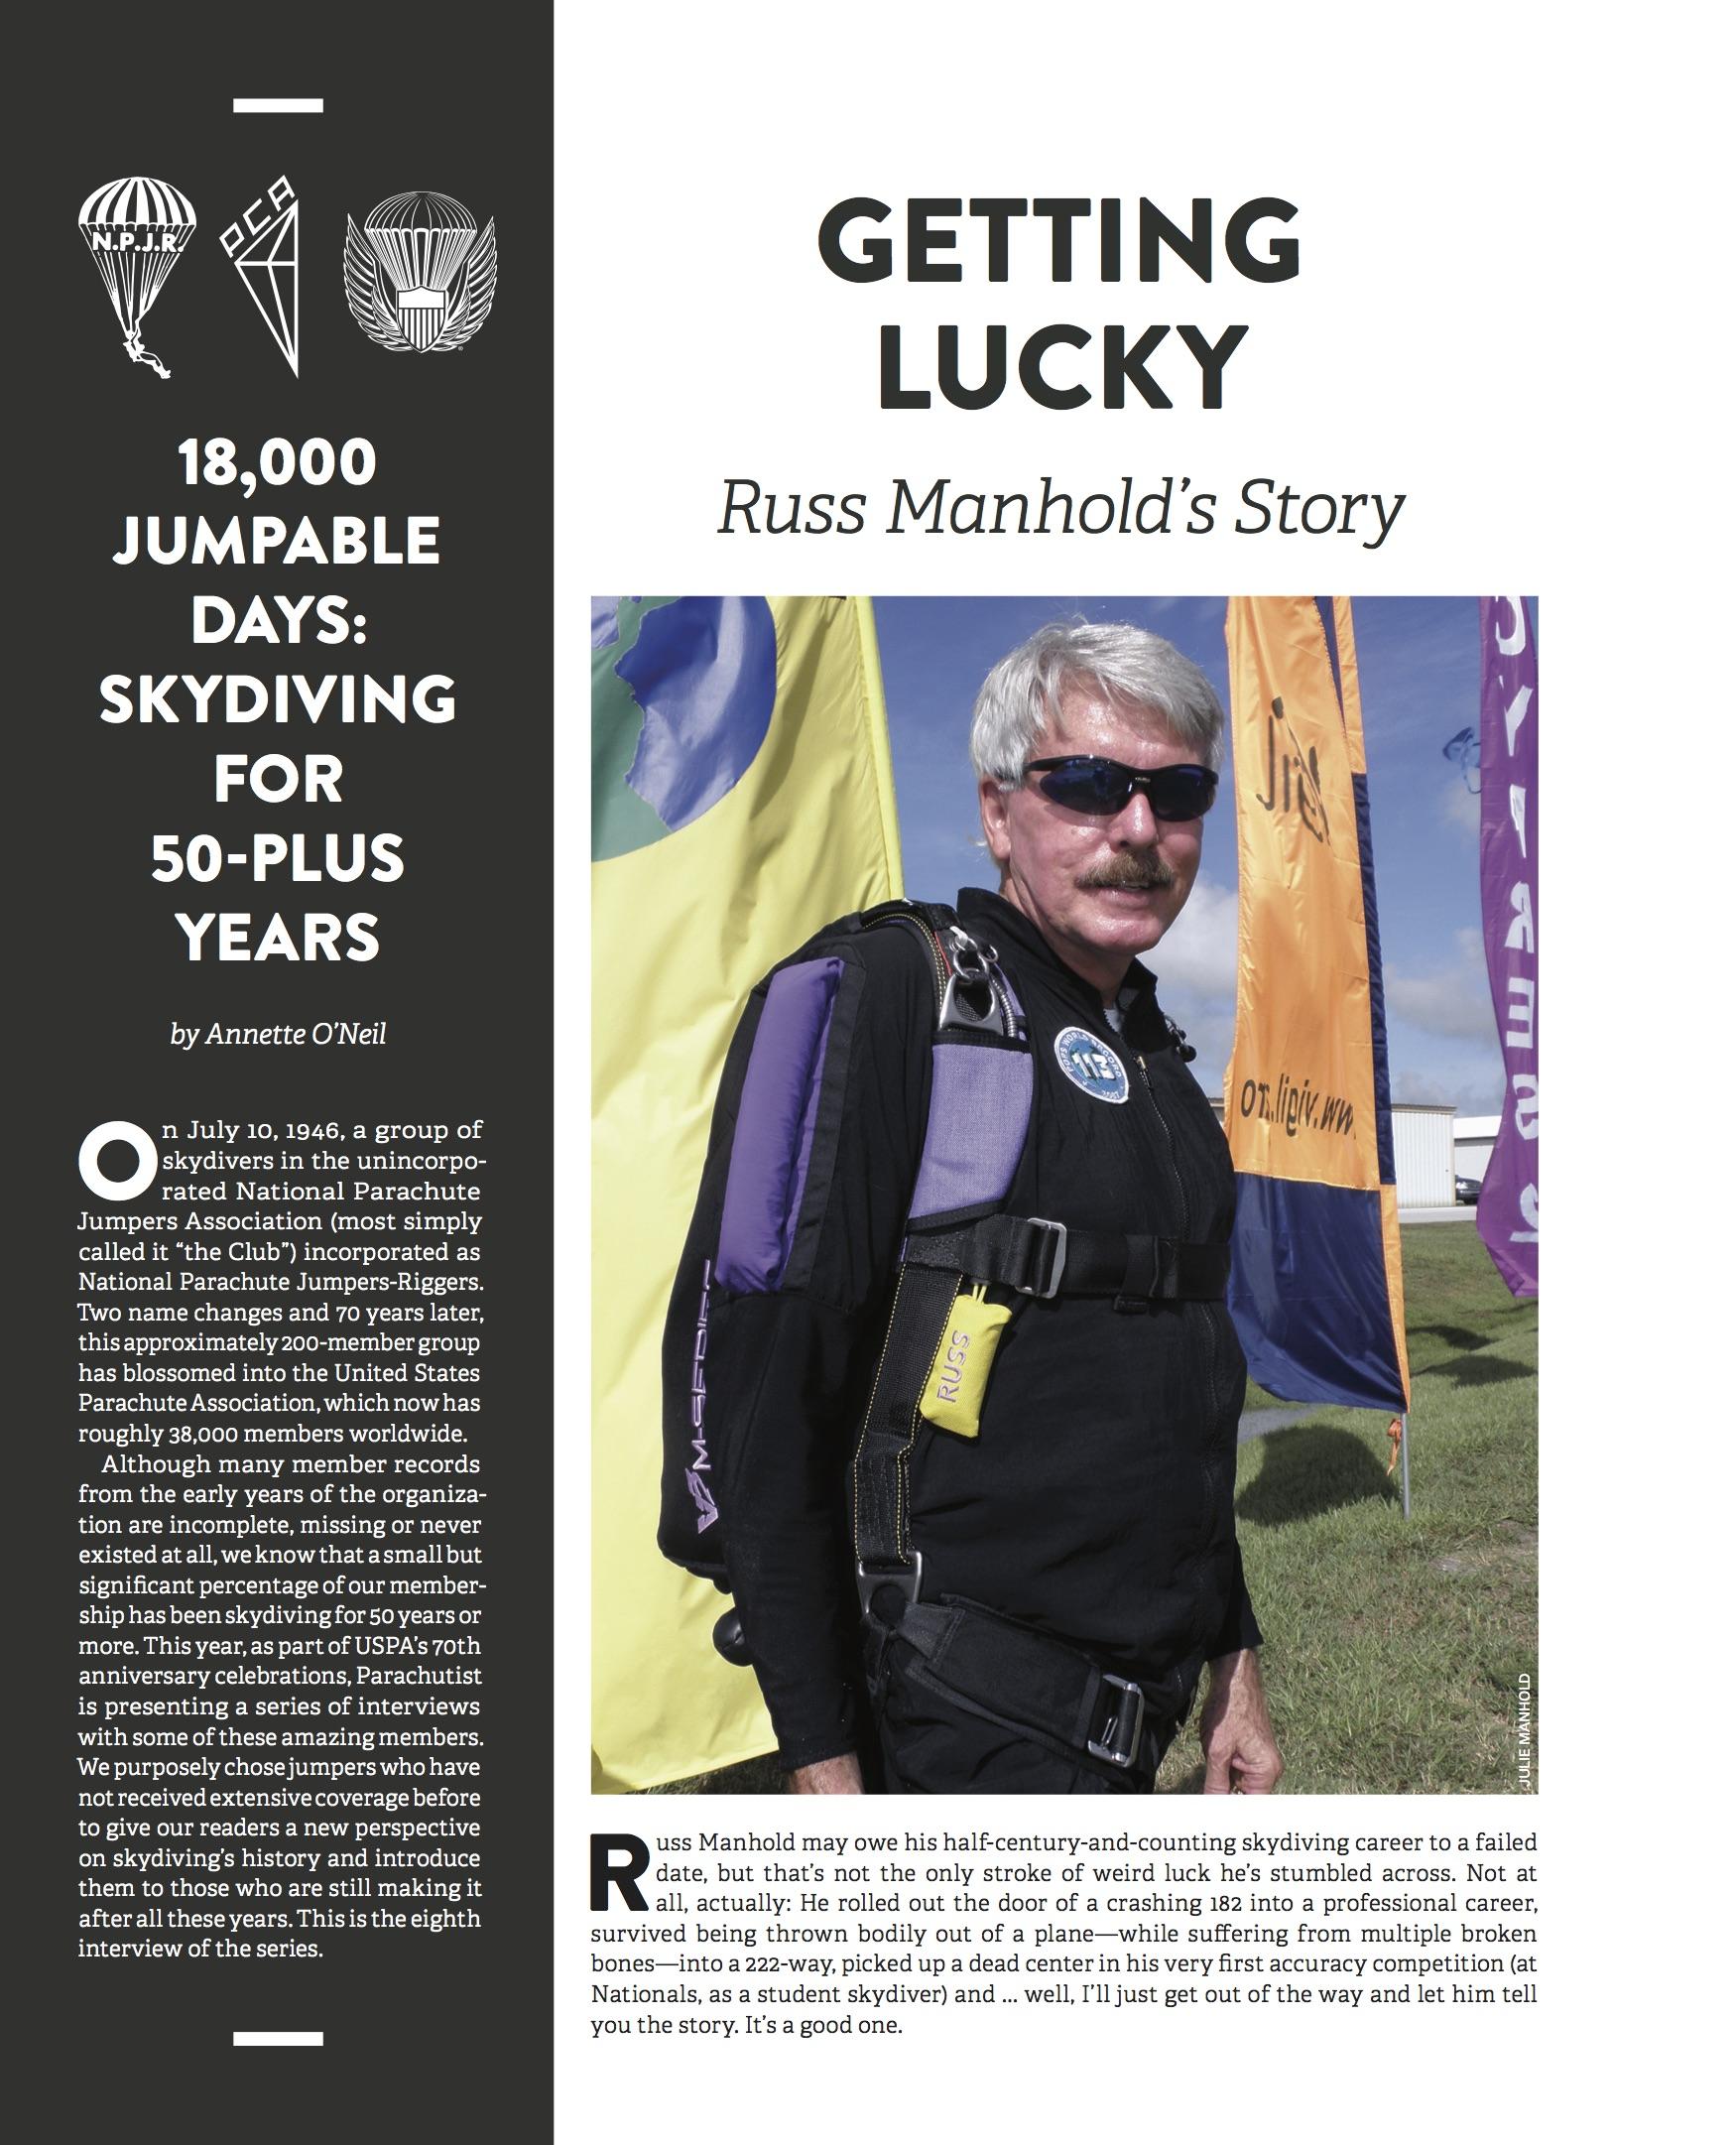 Russ Manhold: Getting Lucky